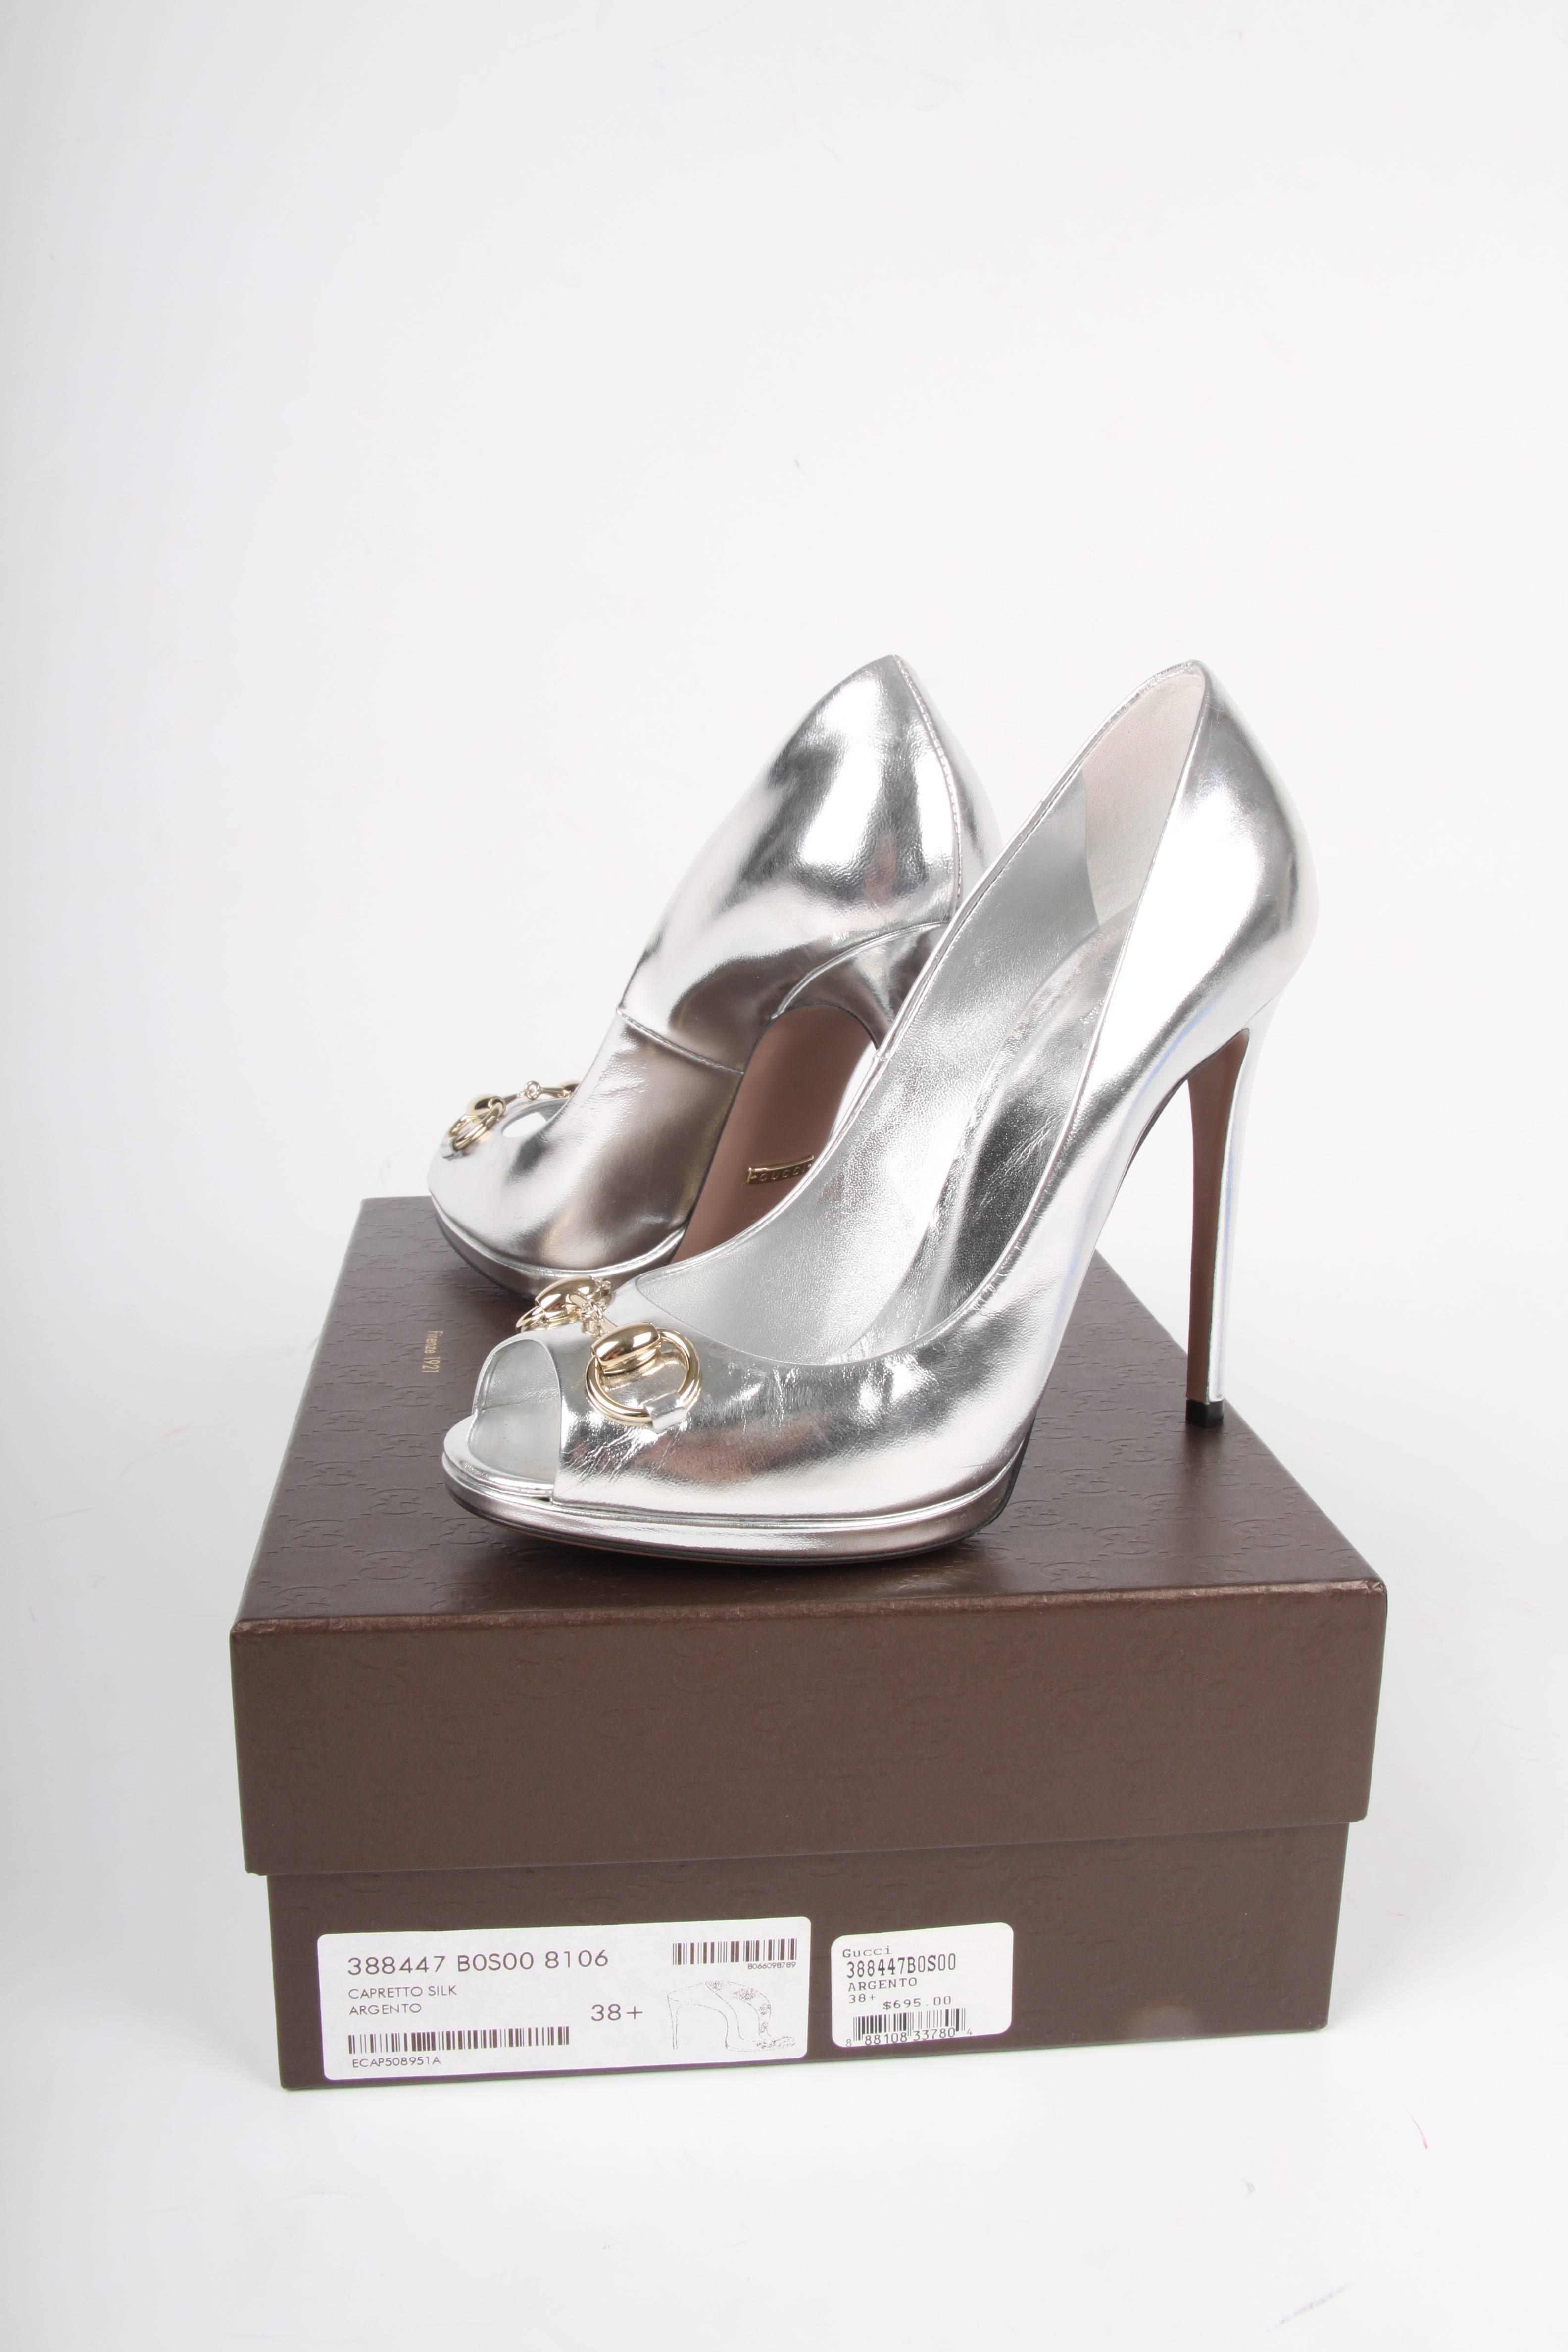 a26035ae5df Gucci Peep-Toe Horsebit Pumps - silver at 1stdibs